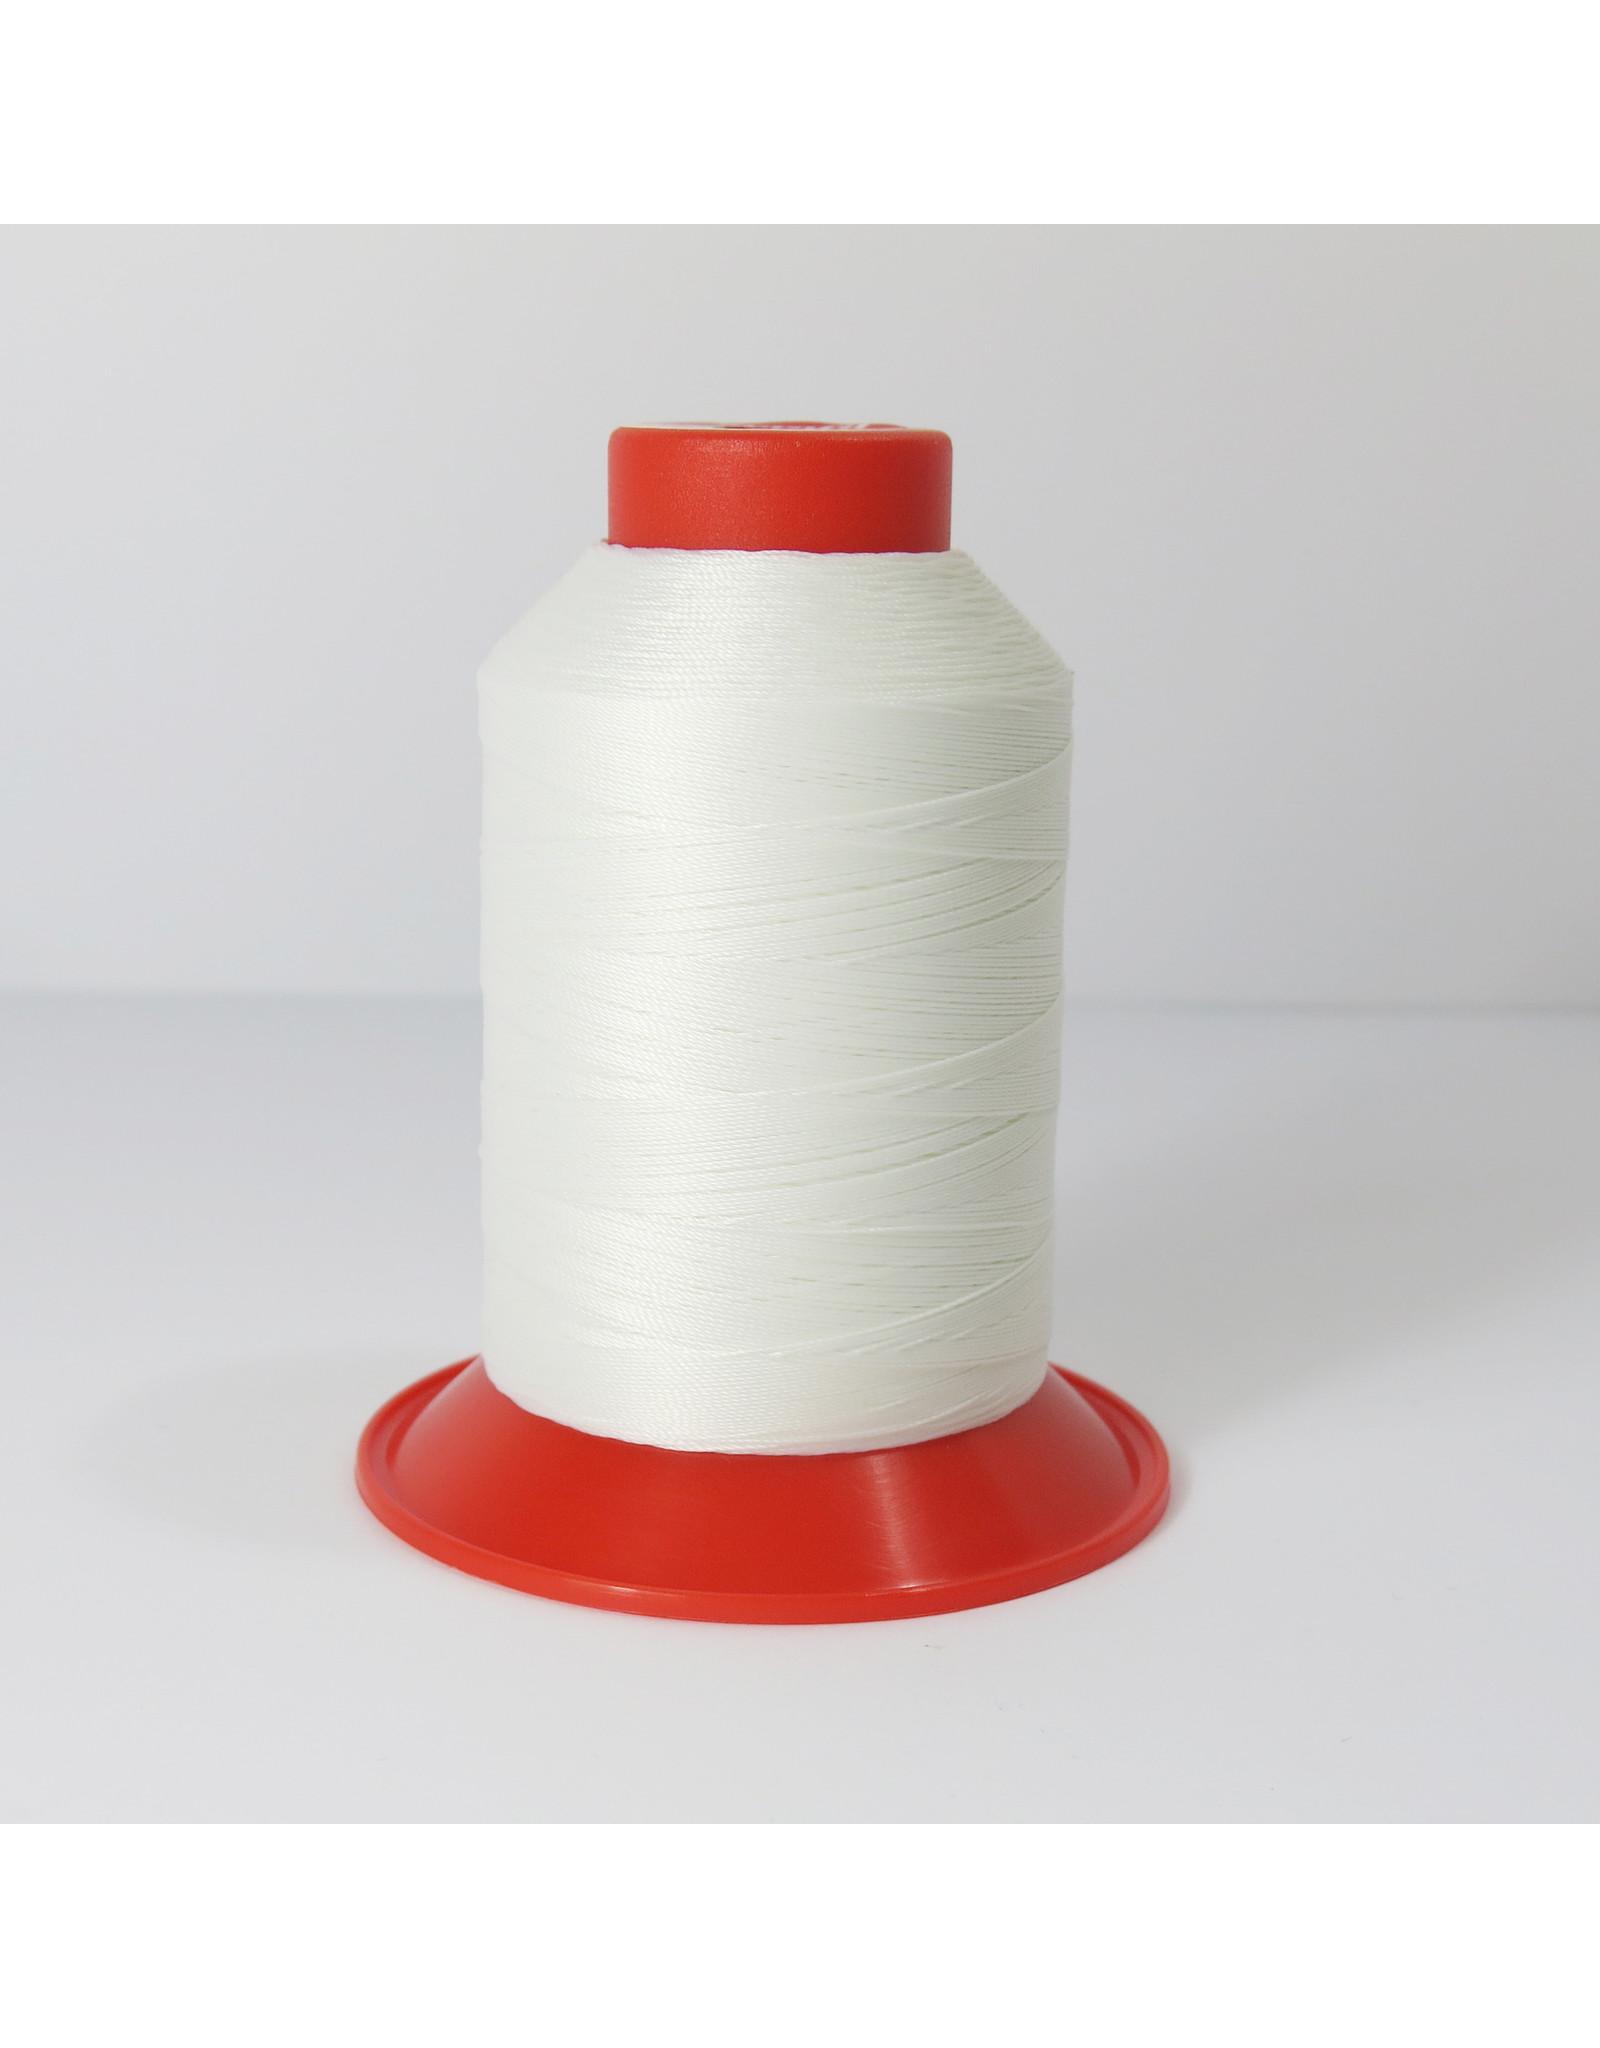 Serafil machine sewing threads 2000